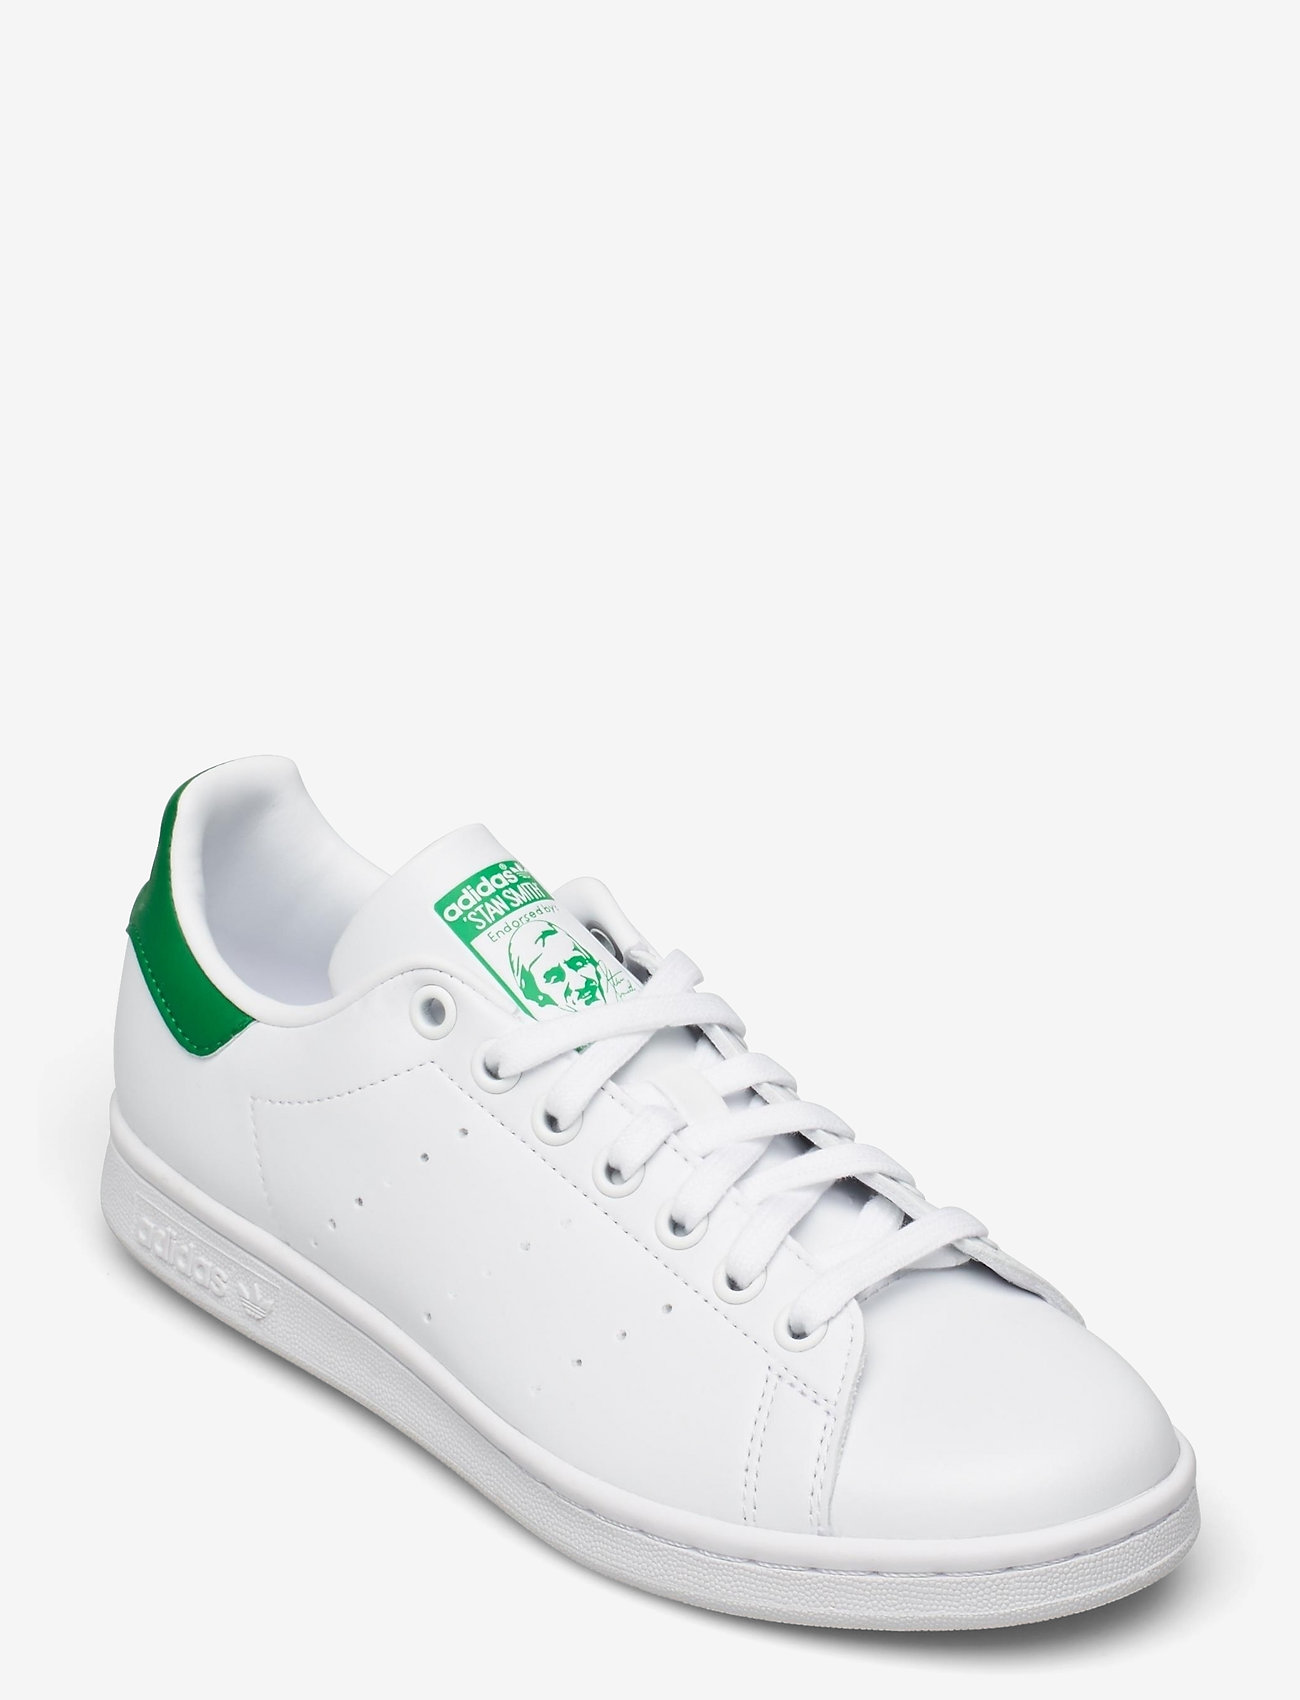 adidas Originals - Stan Smith - låga sneakers - ftwwht/ftwwht/green - 1